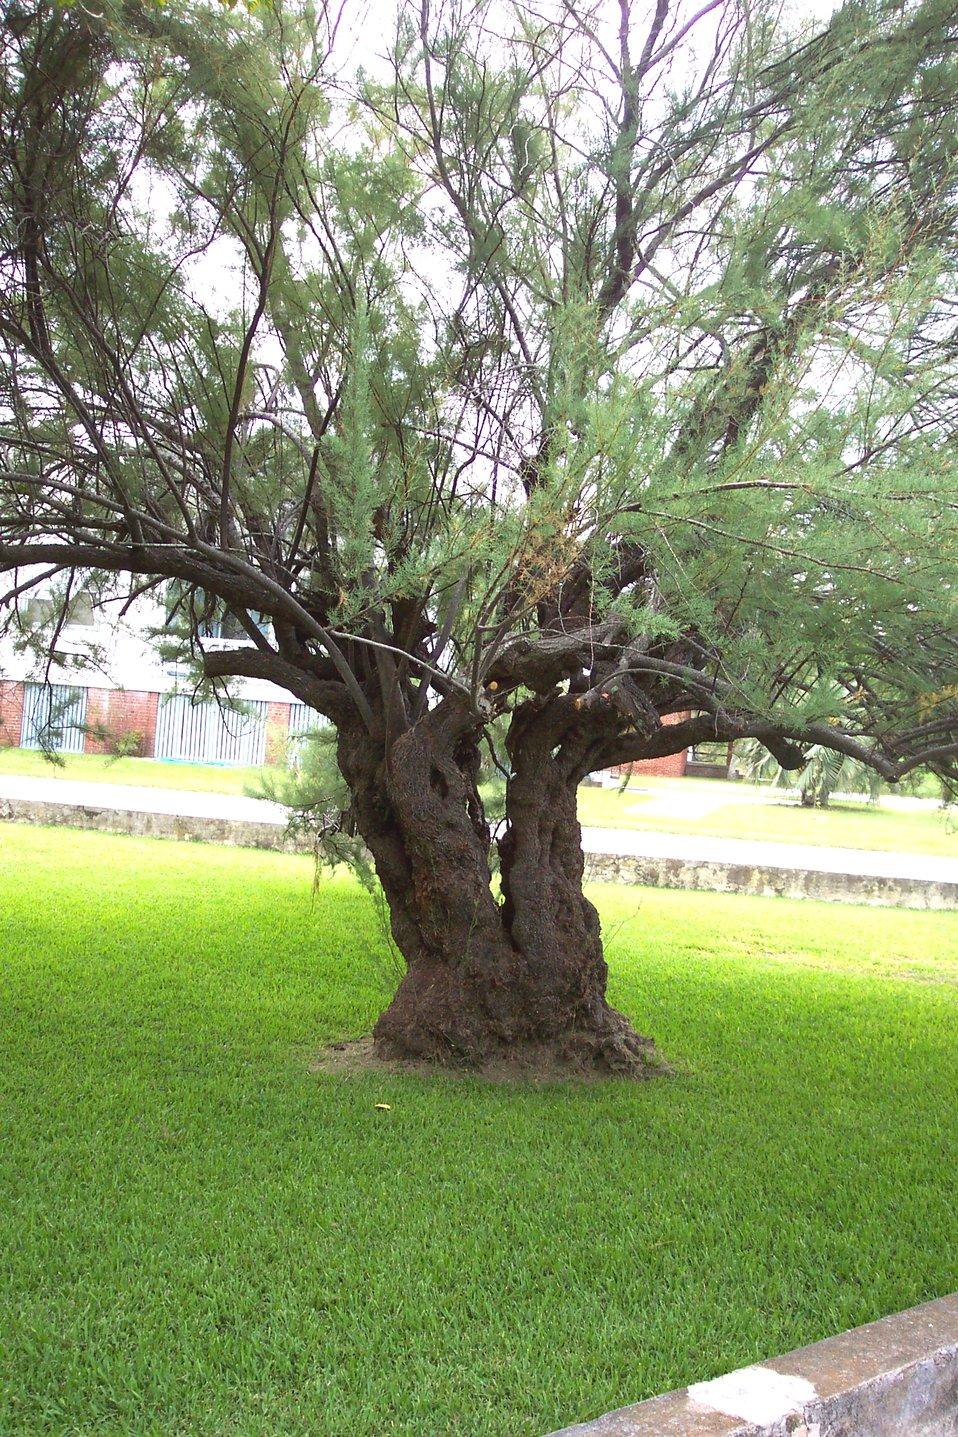 A gnarly tree at Stella Maris Catholic Church on Sullivans Island.